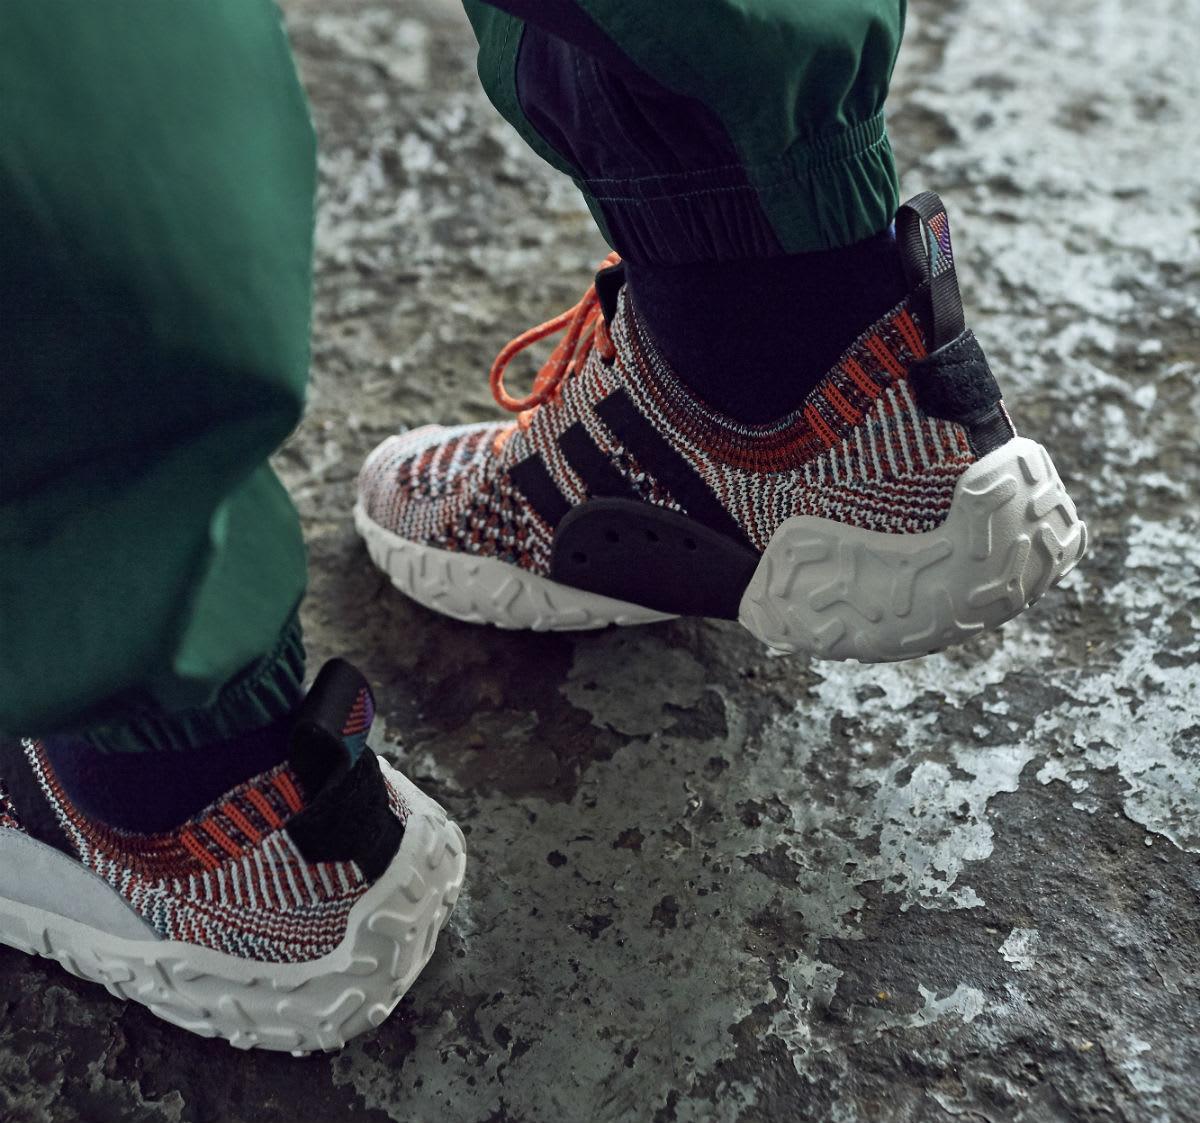 Adidas Atric F/22 Primeknit Trace Orange Release Date CQ3026 Heel